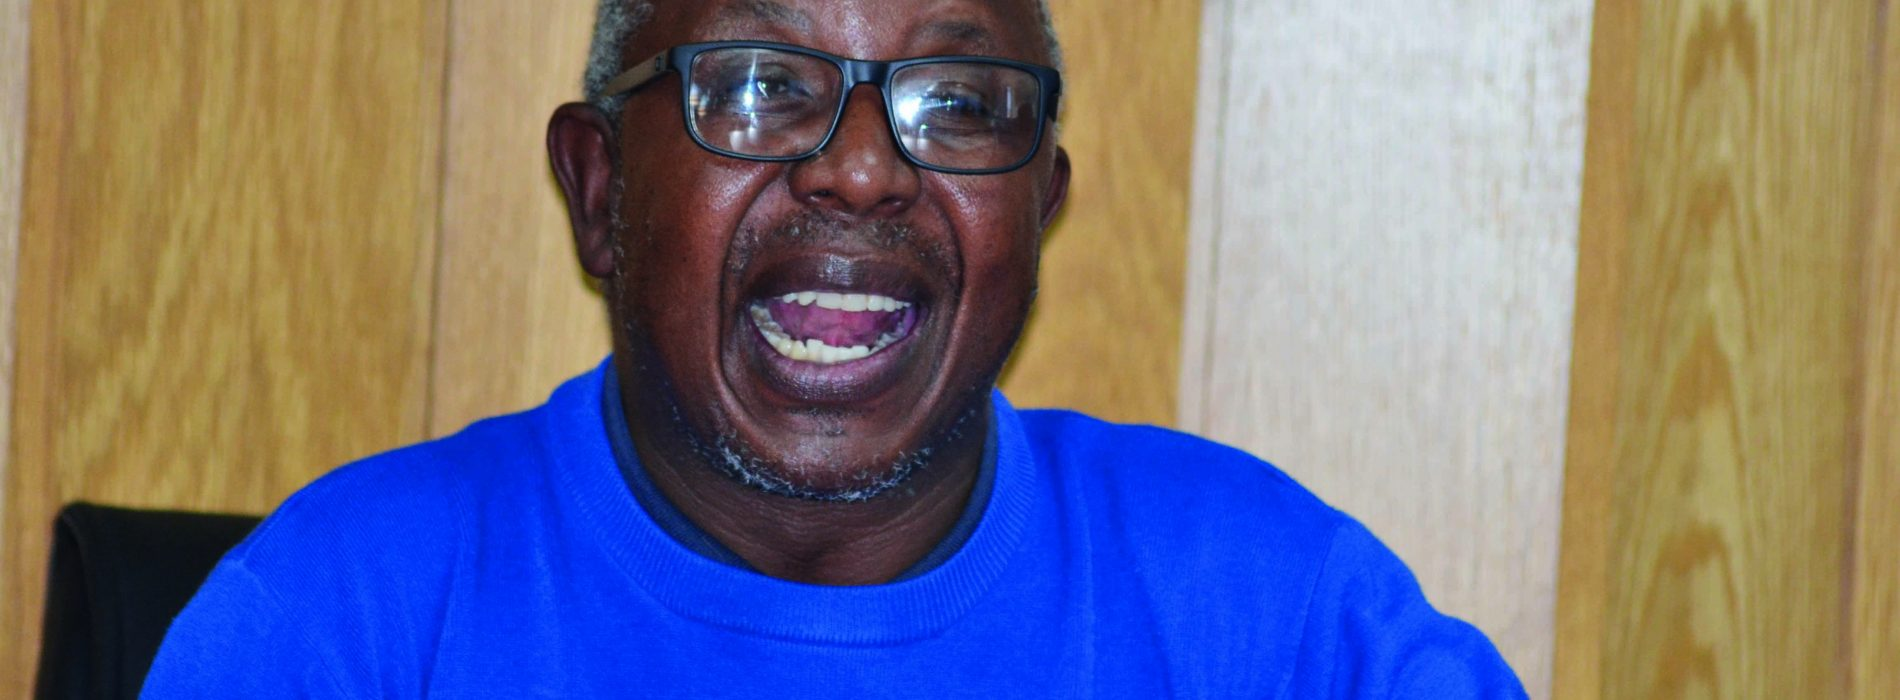 Khotsang Moshoeshoe: The unsung hero!